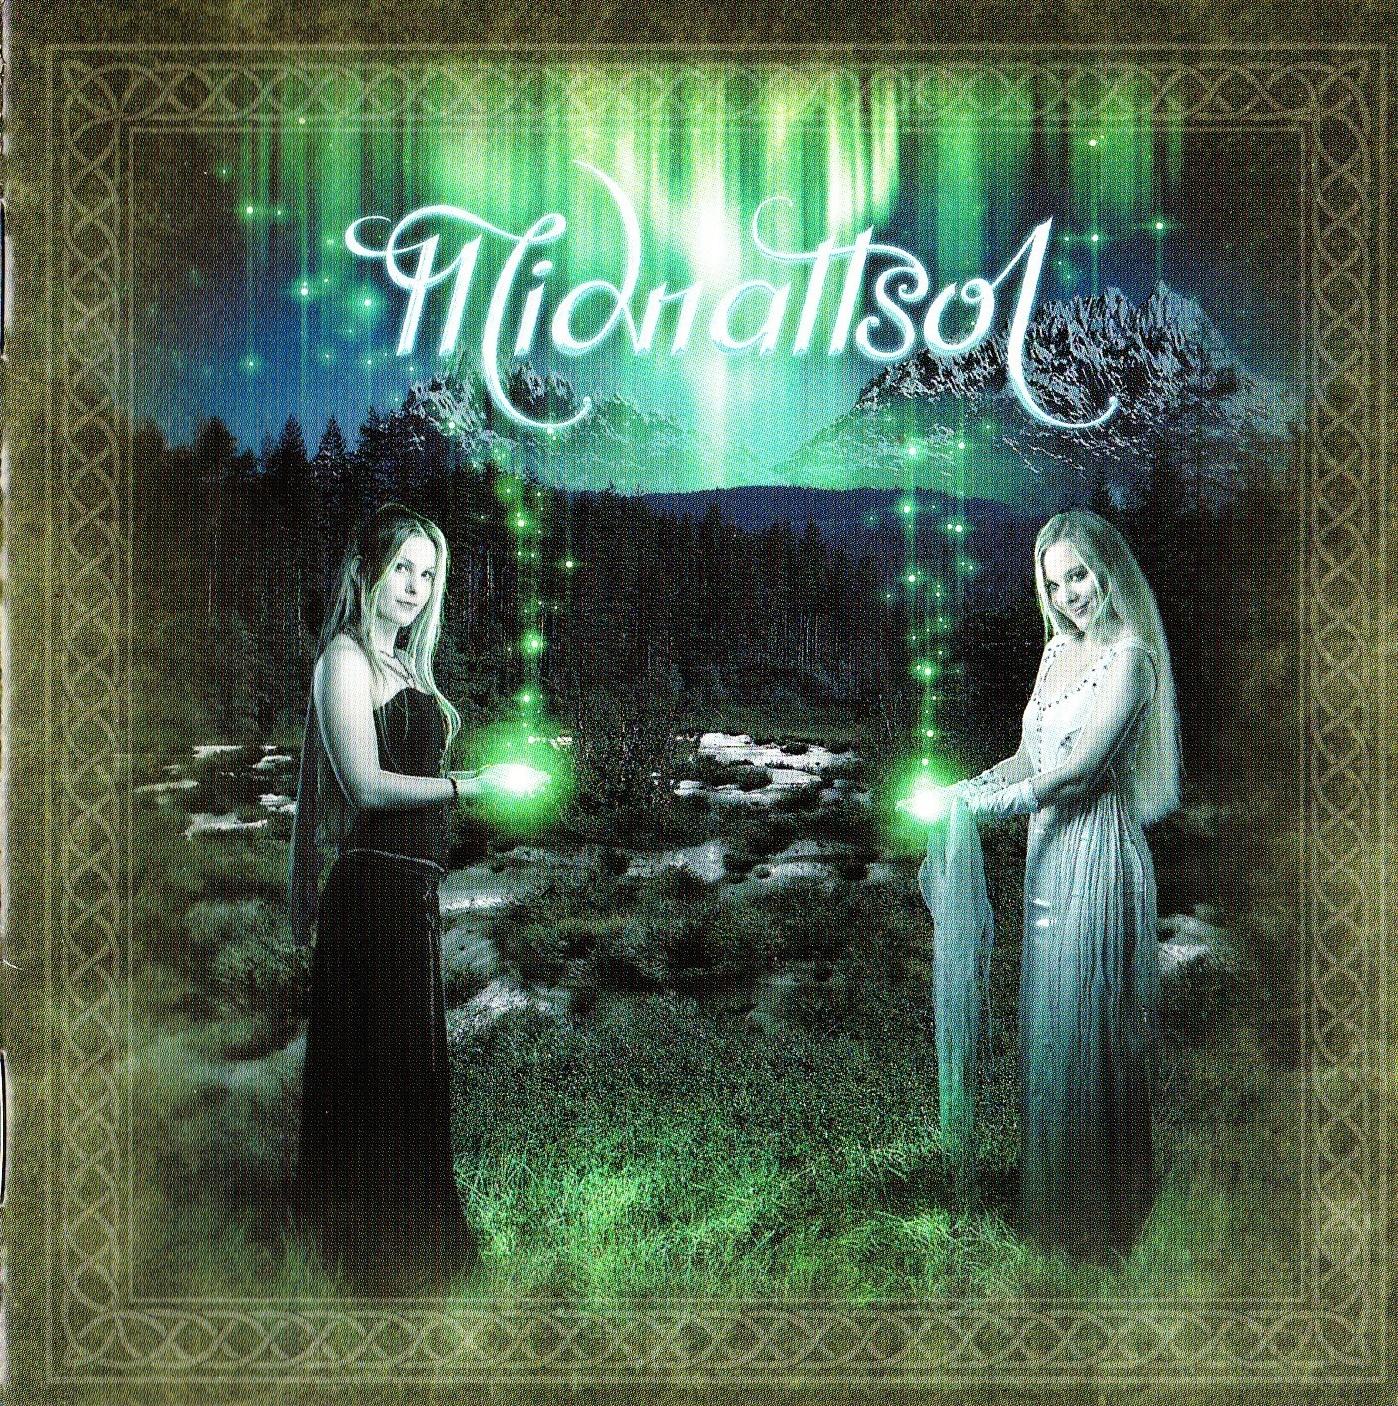 Midnattsol — Nordlys (2008)